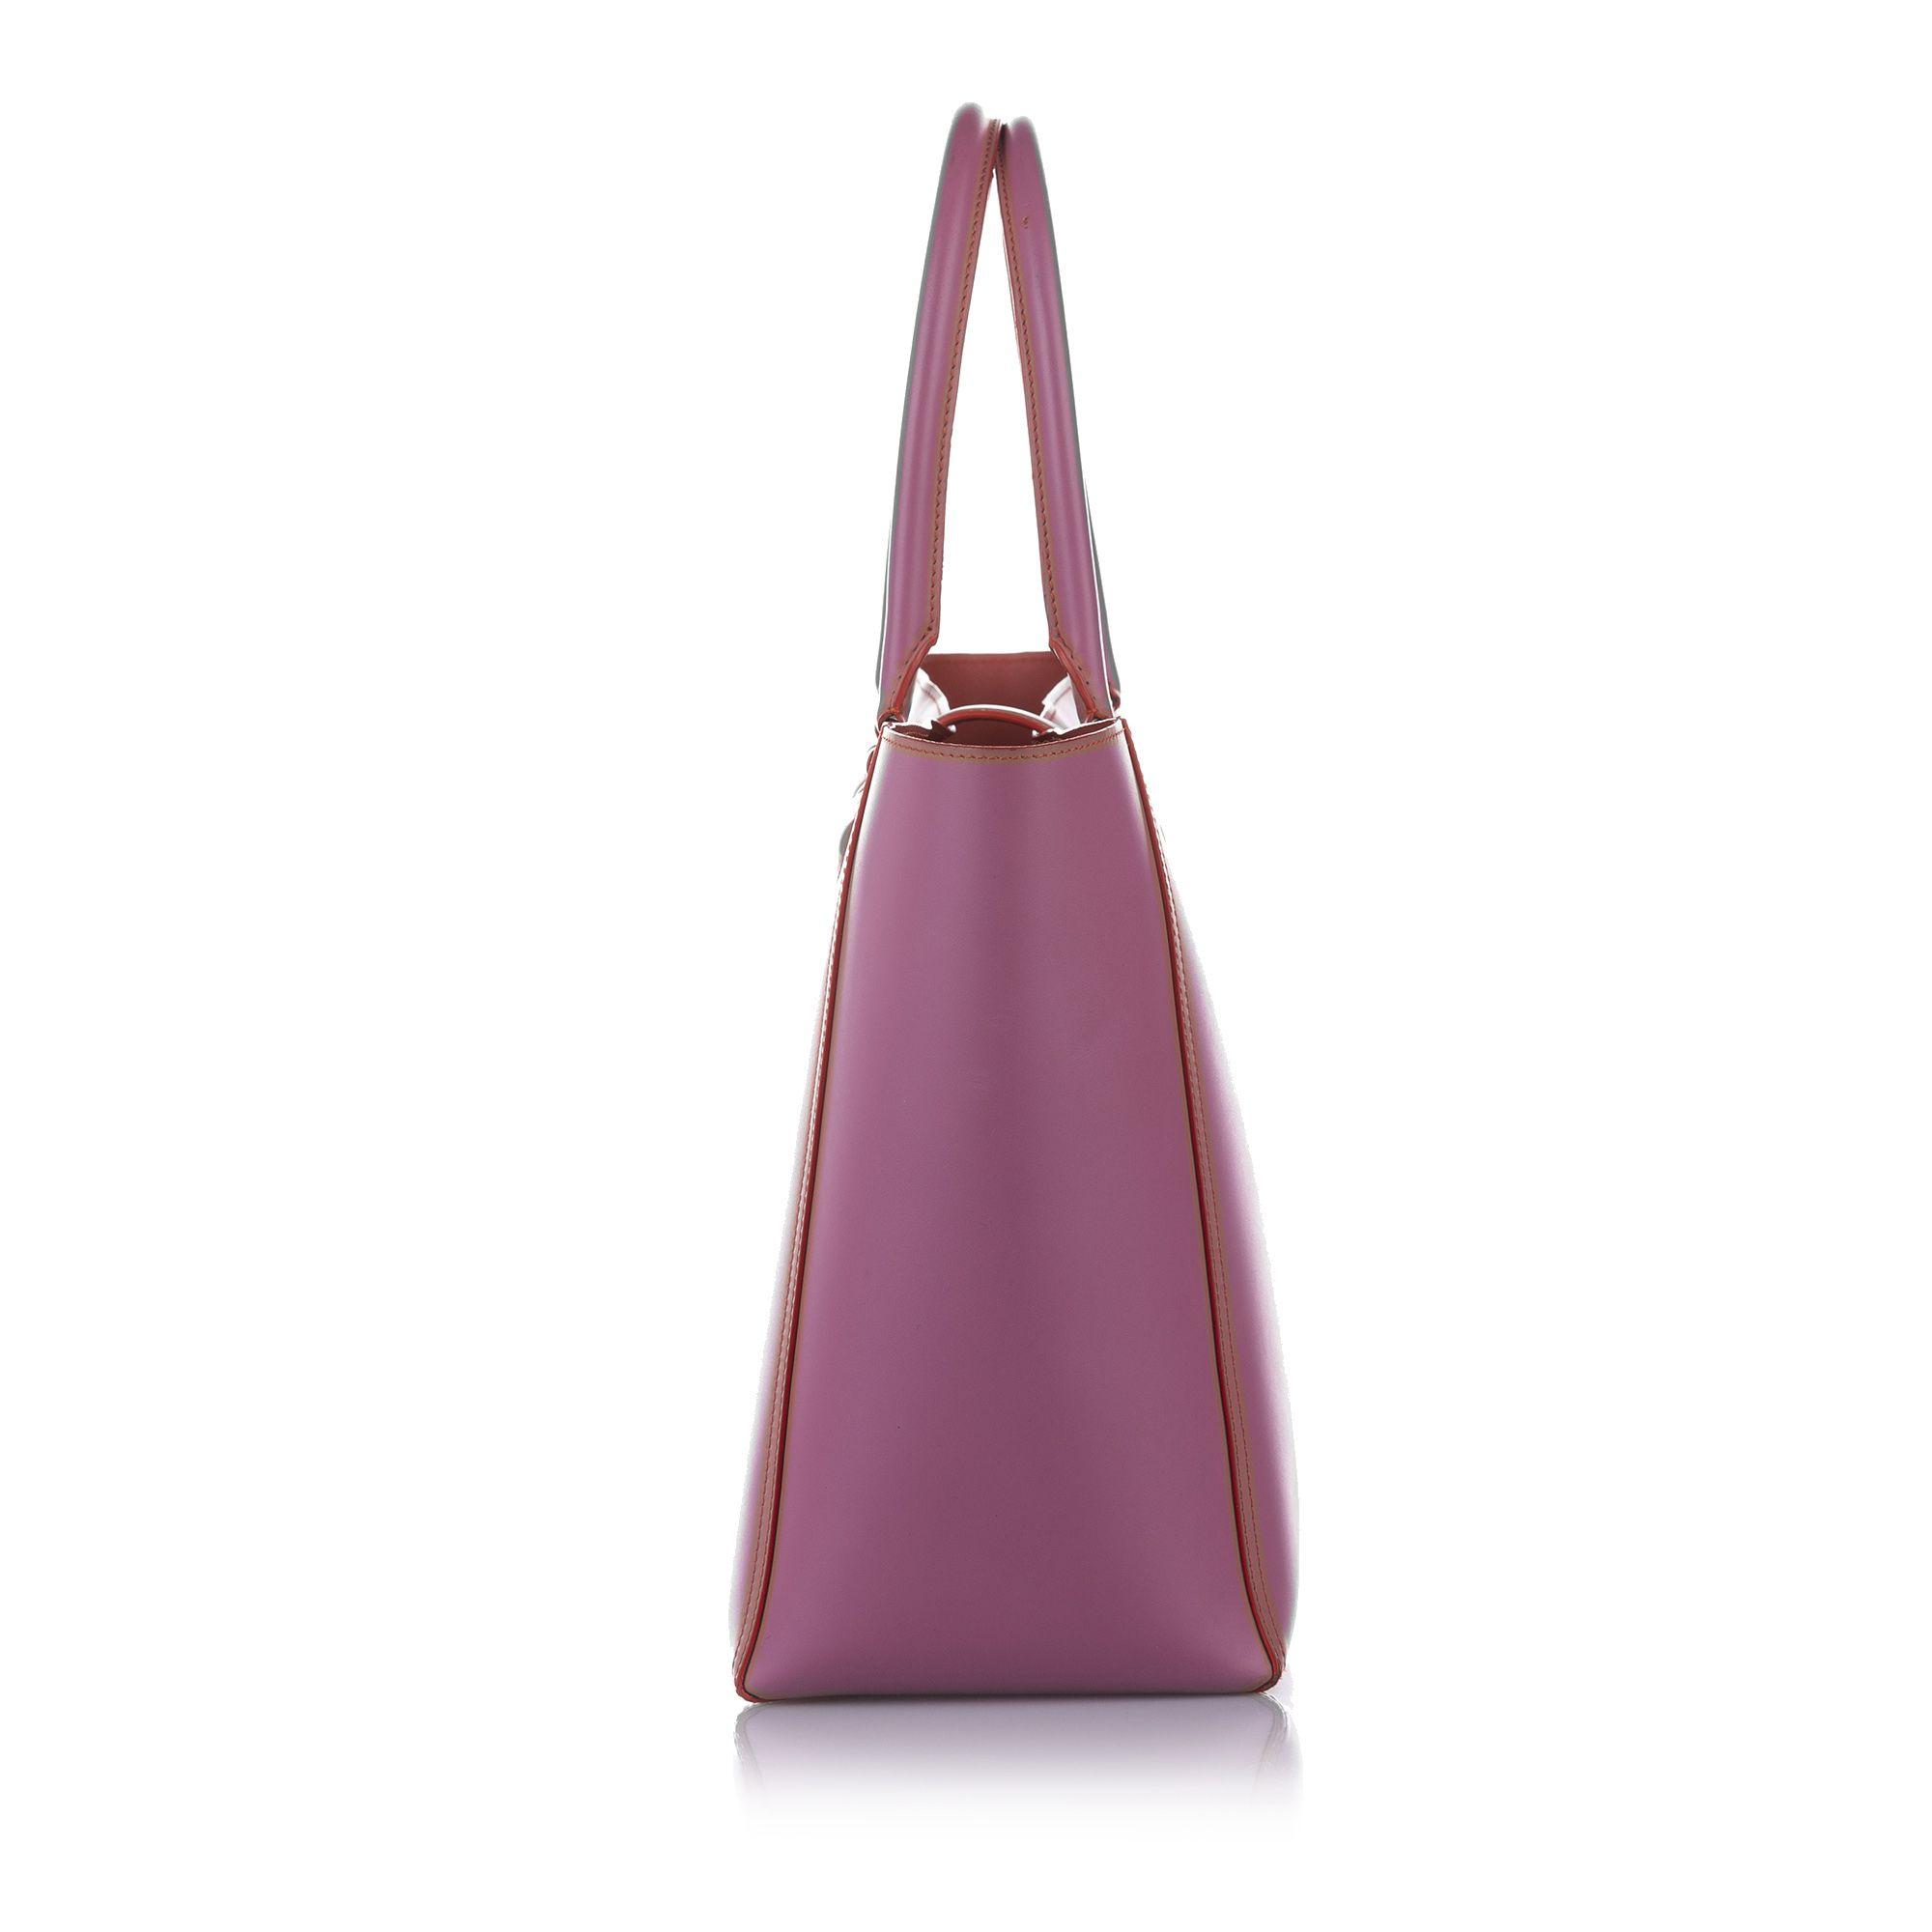 Vintage Loewe Amazona Leather Tote Bag Pink